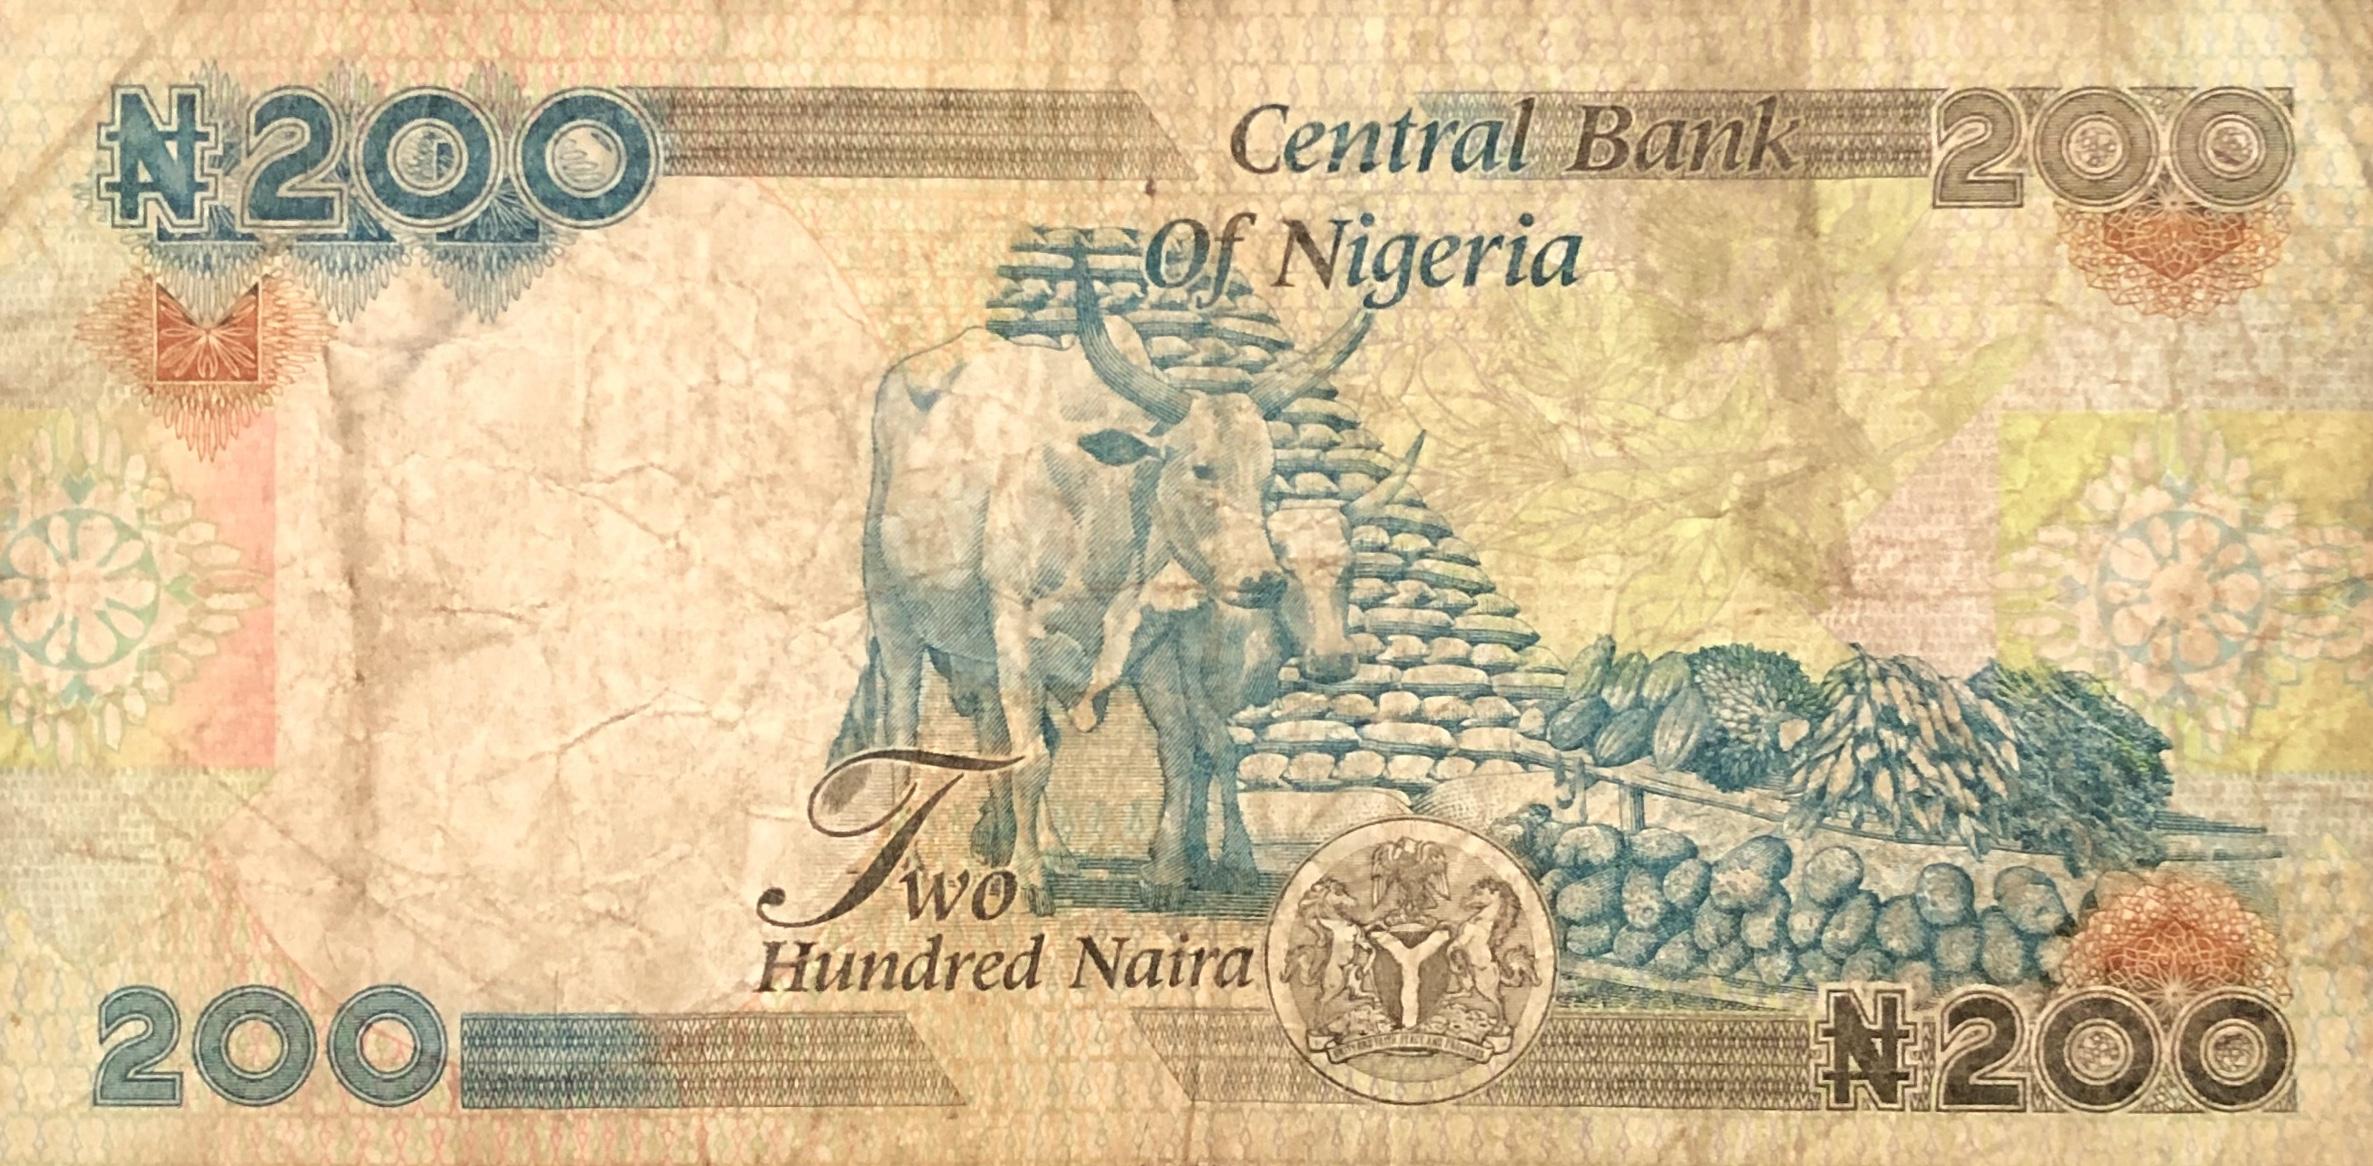 NIGERIA 200 NAIRA 2017 P 29 NEW DATE SIGN UNC